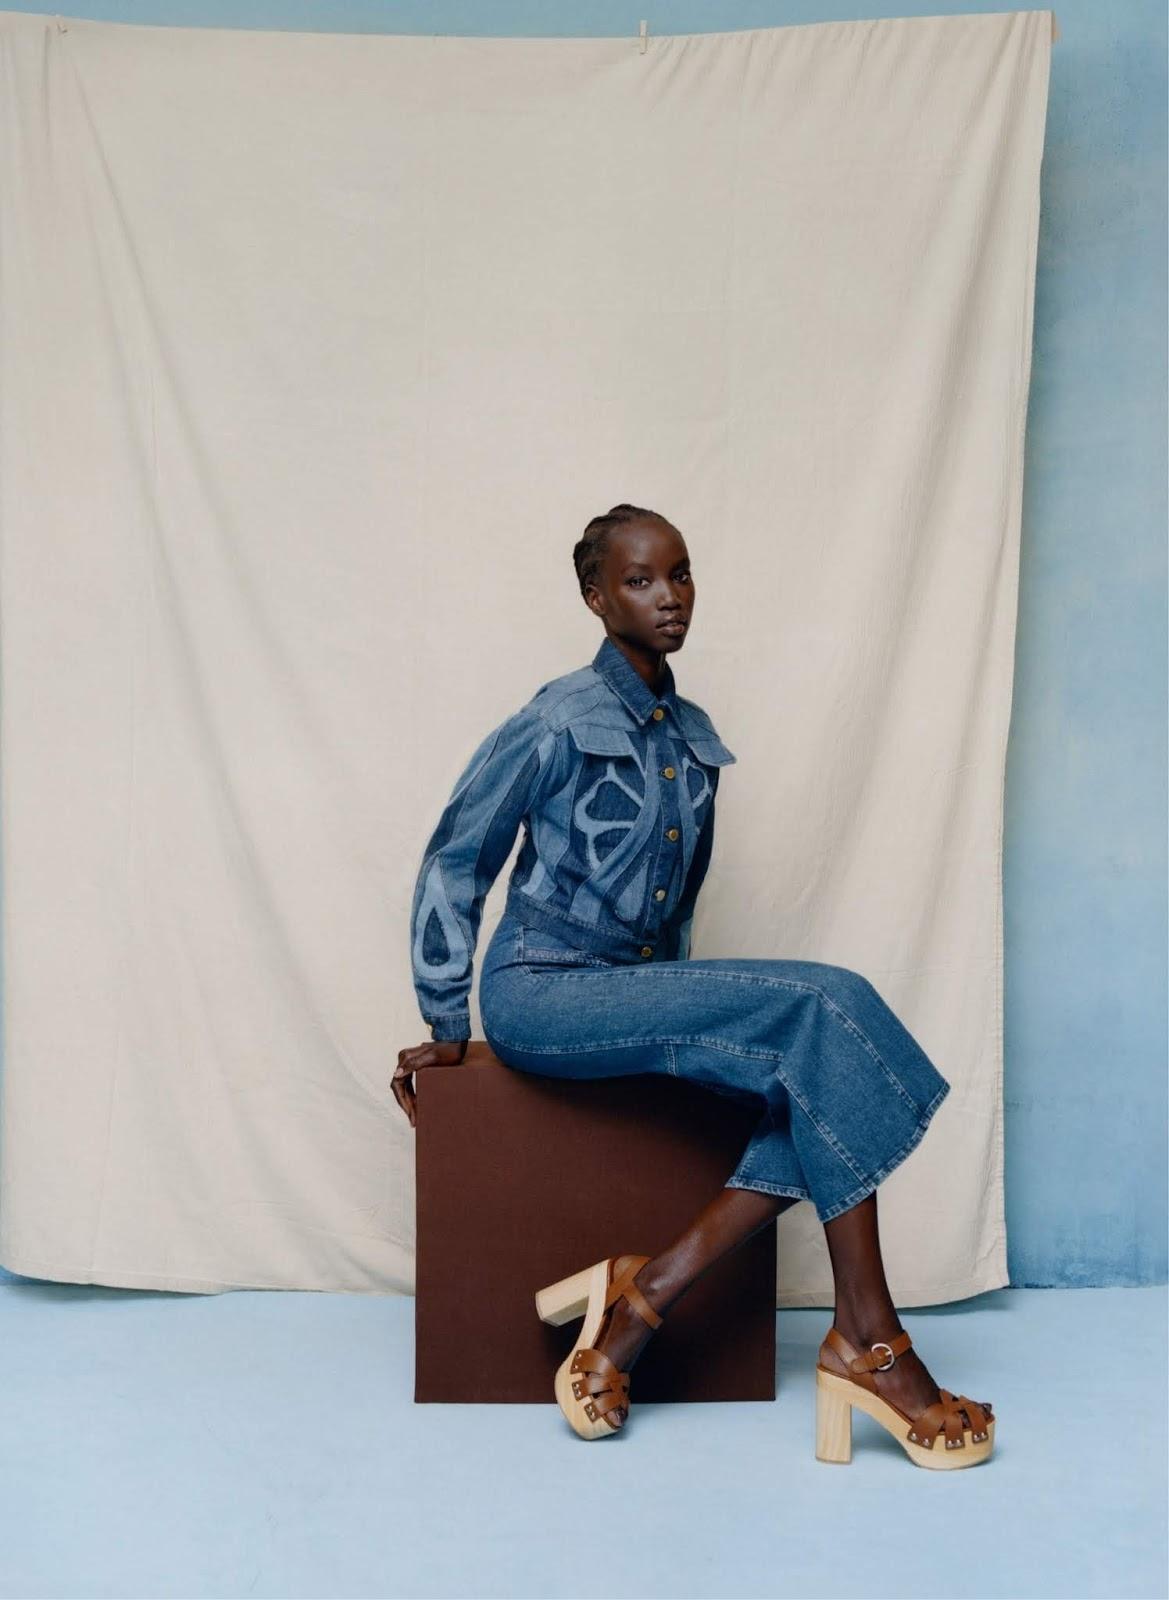 Anok Yai - Alberta Ferretti jacket and jeans. Prada sandals